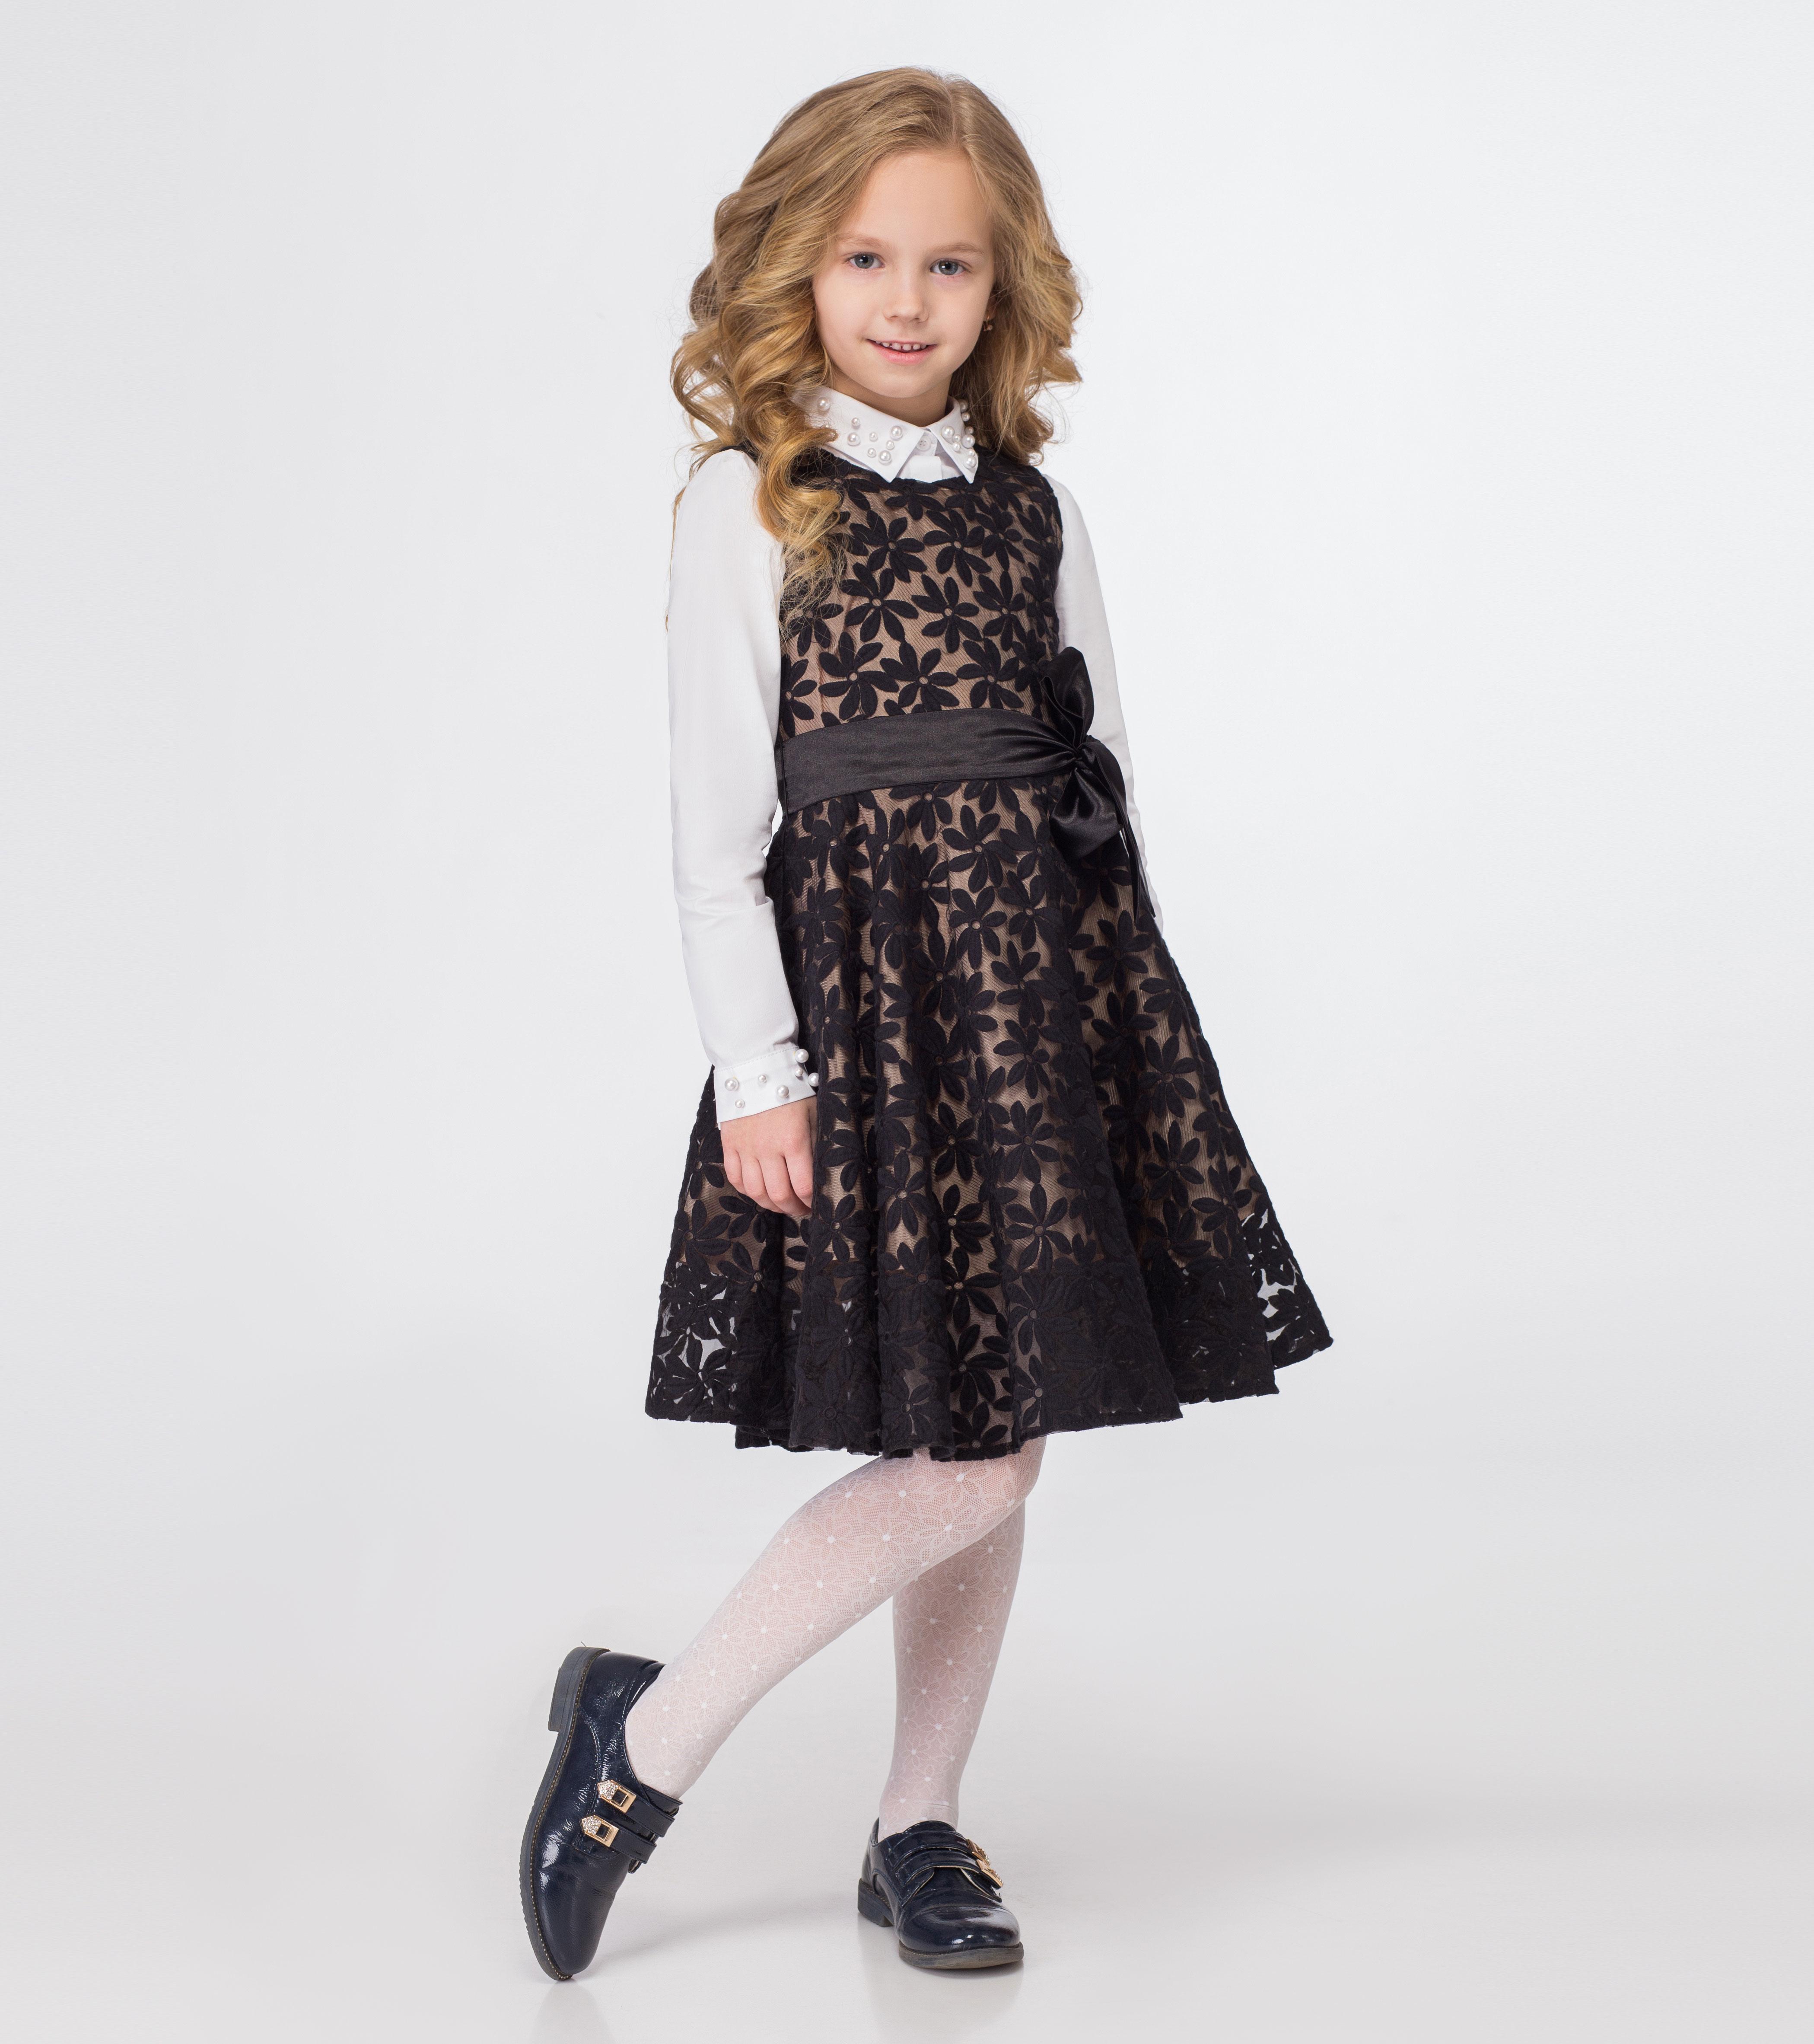 860821f75db Сарафан для девочки 223180 купить в интернет-магазине shop.panda.by ...